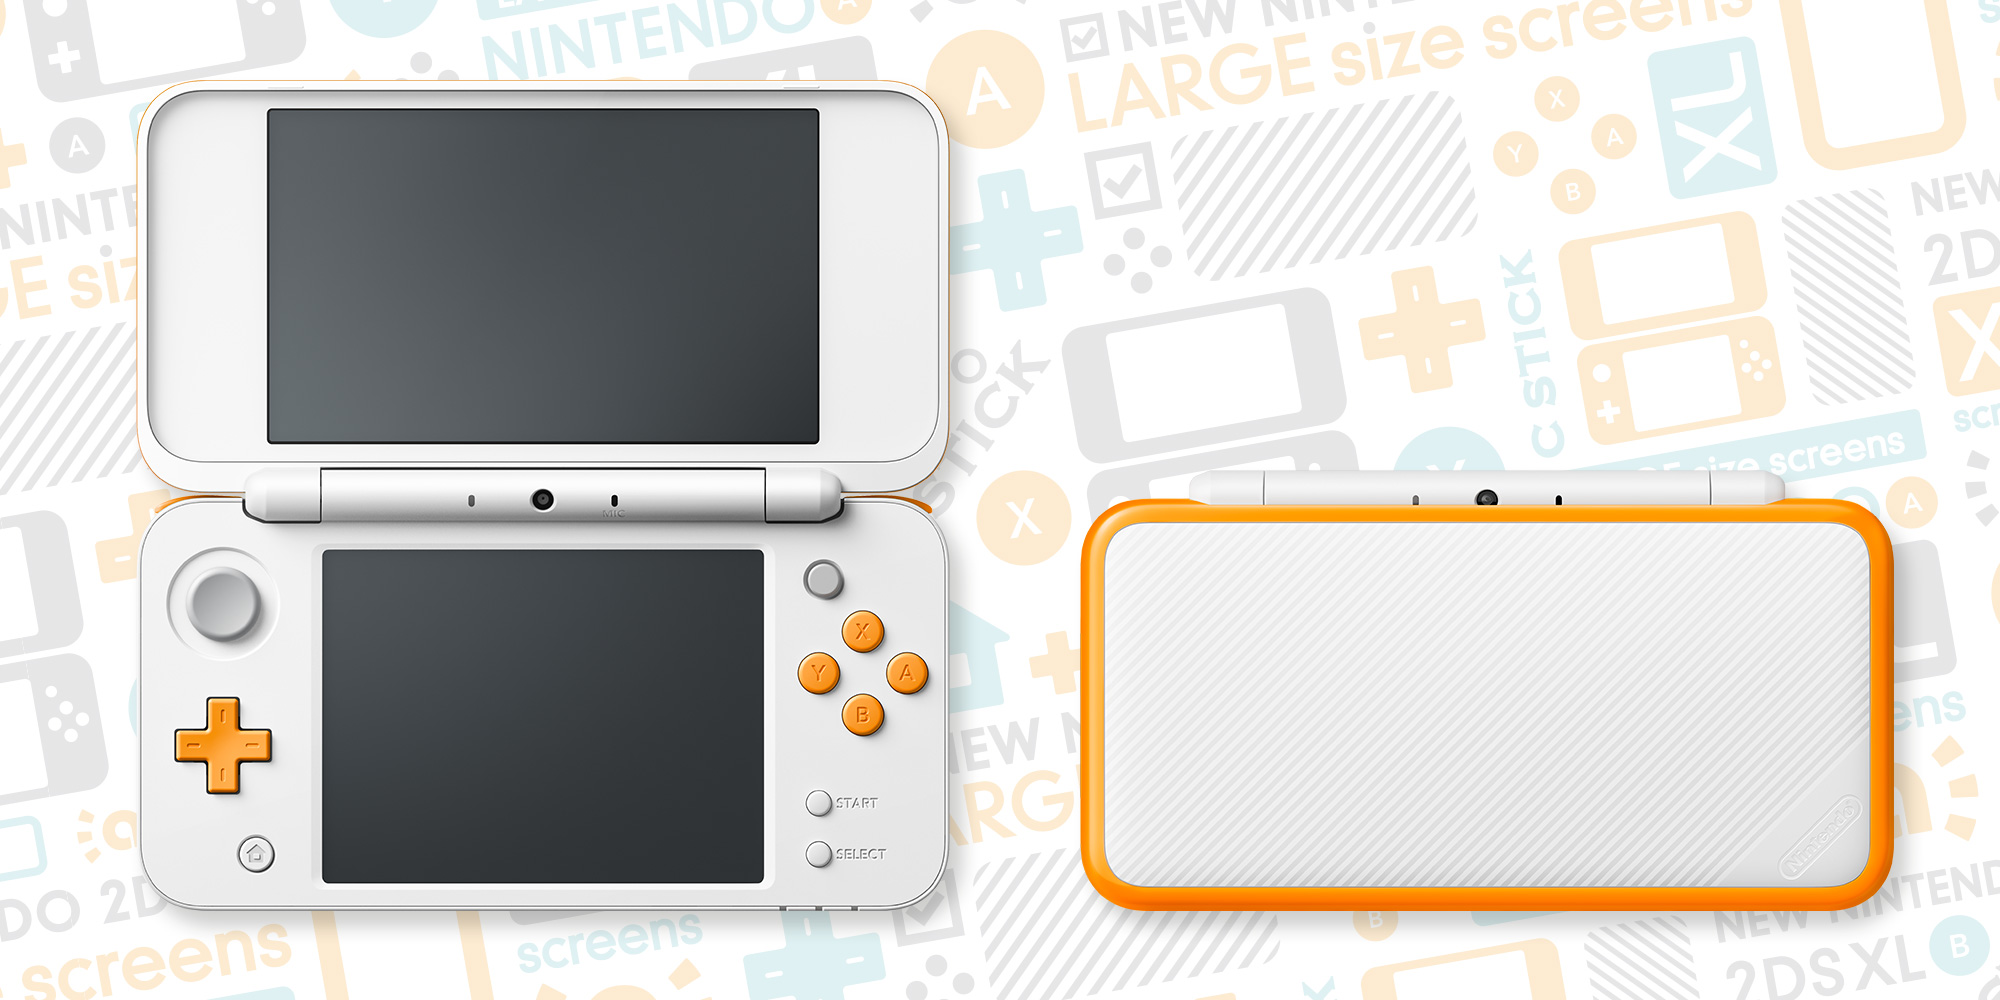 Blanc + orange